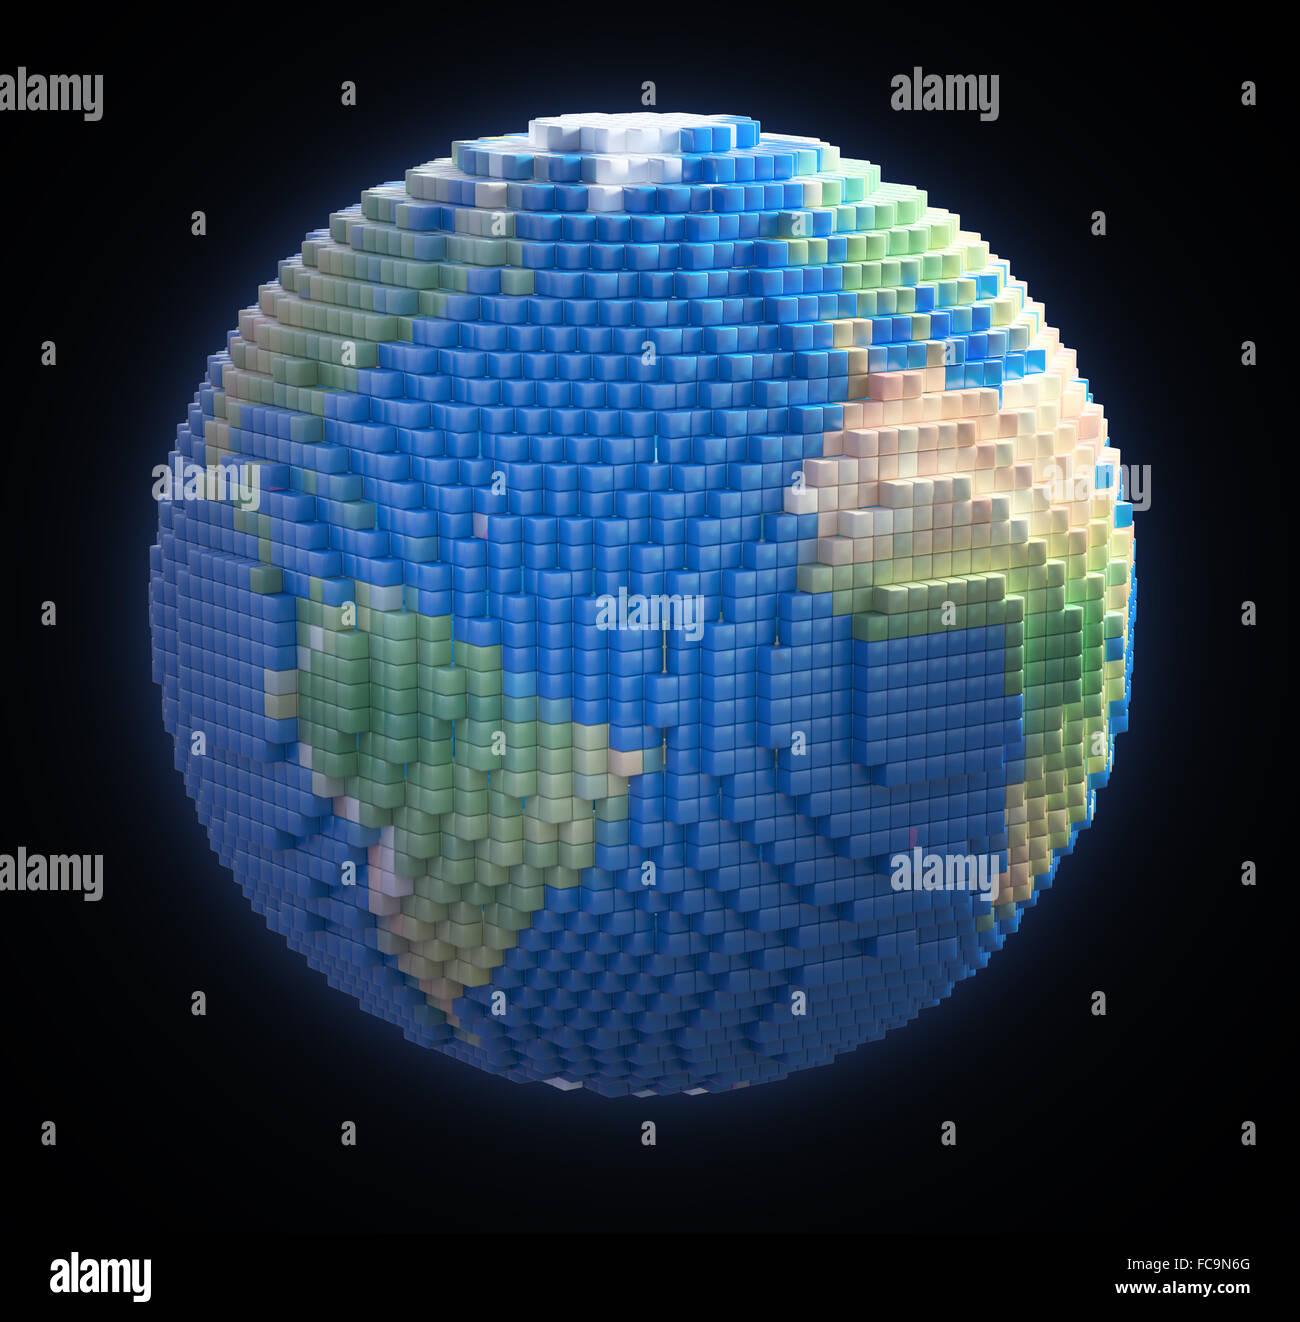 Globo terrestre fatta di voxel 3d cubi Immagini Stock